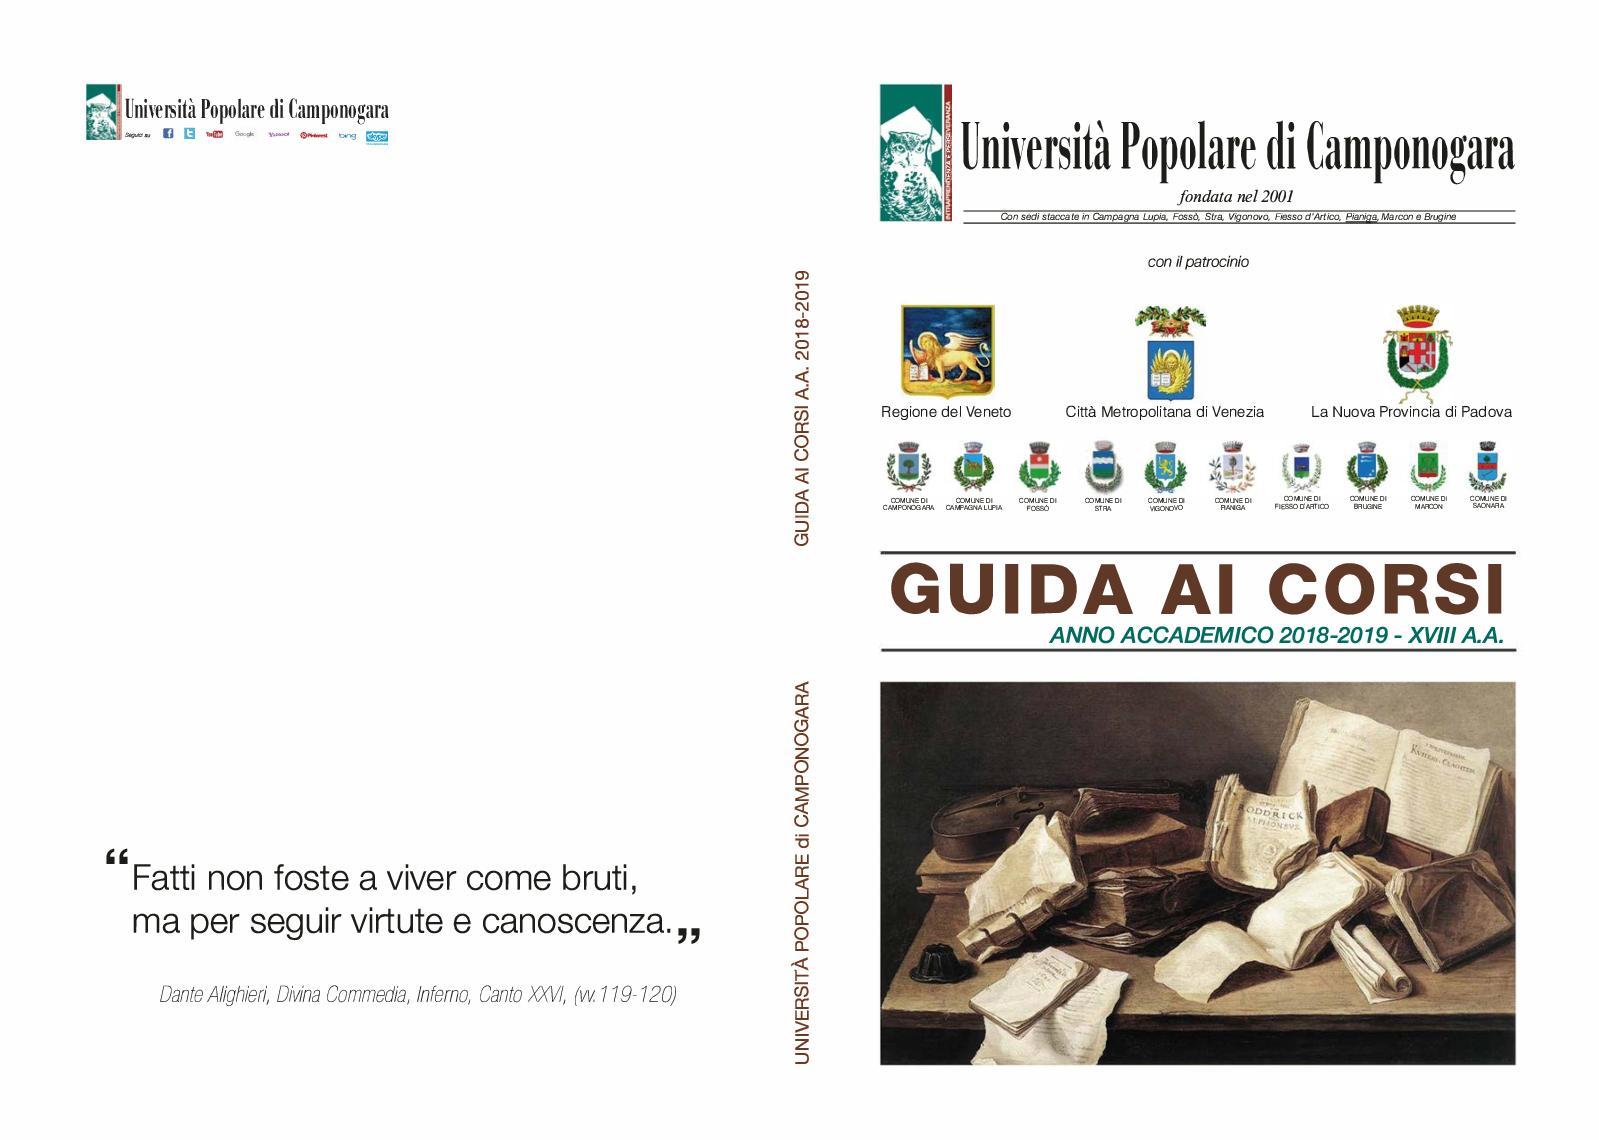 Calaméo Uni Pop Camponogara Guida Corsi Completa 2018 2019